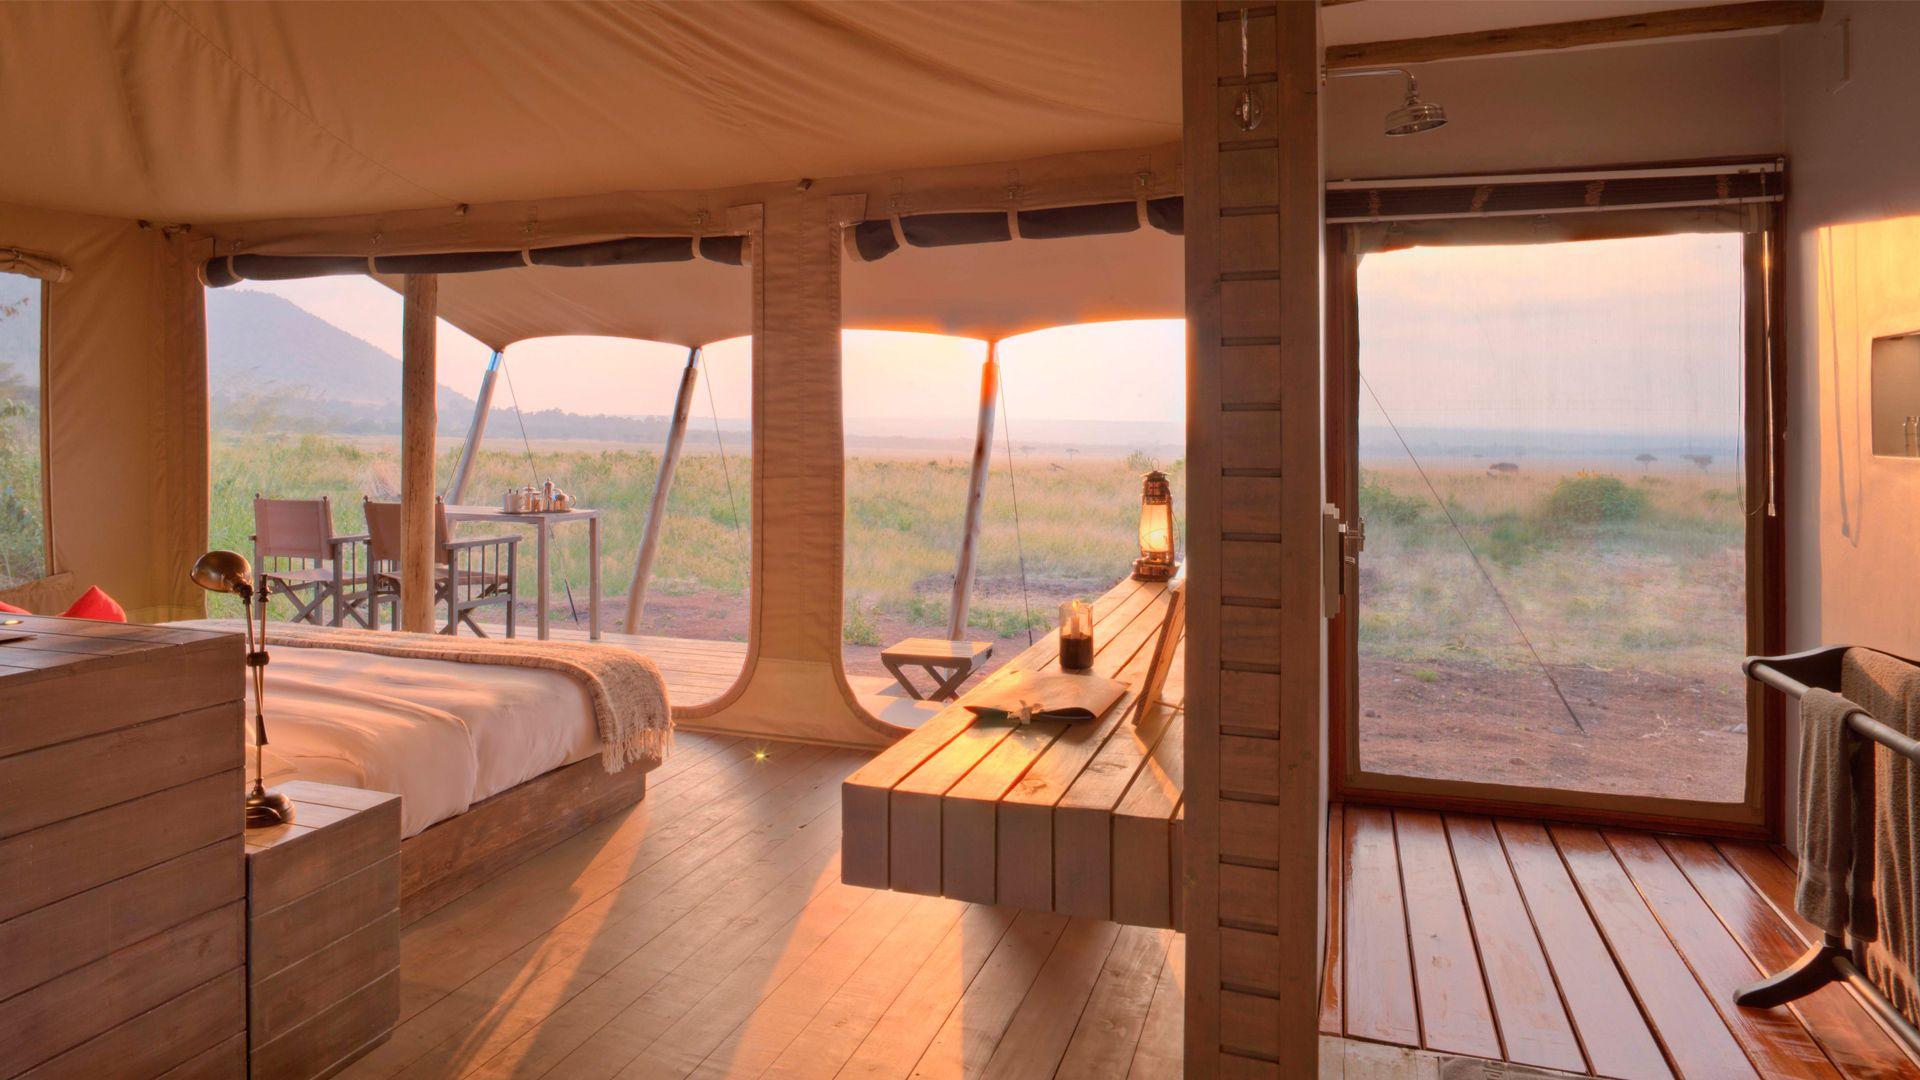 Superior Tent With View Of The Masai Mara At Andbeyond Kichwa Tembo